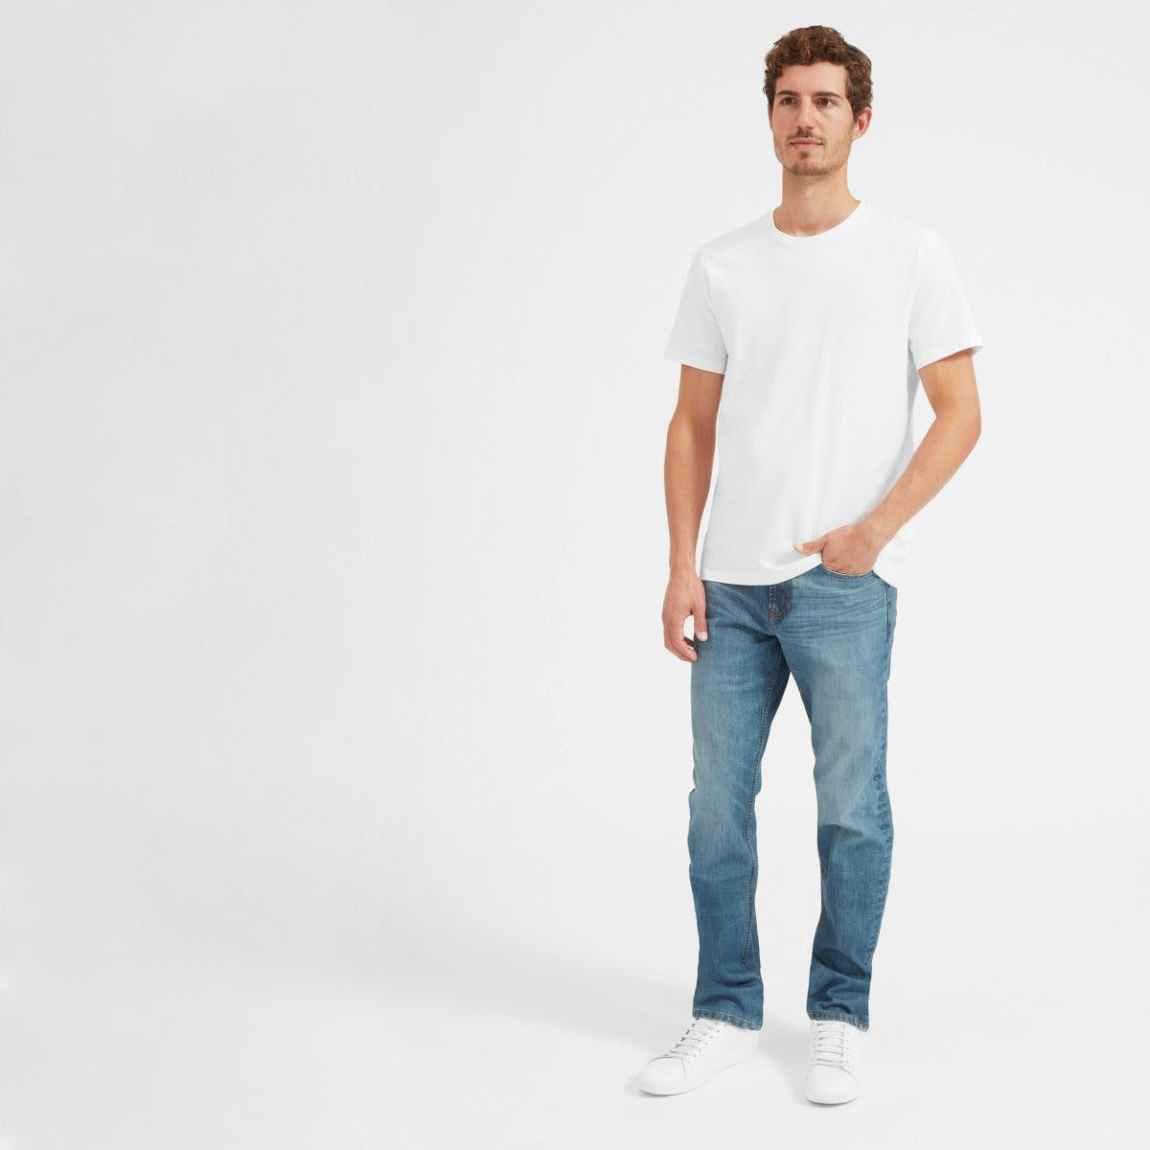 everlane, everlane jeans, everlane denim, japanese denim, straight fit jeans, light washed jeans, denimblog, denim blog